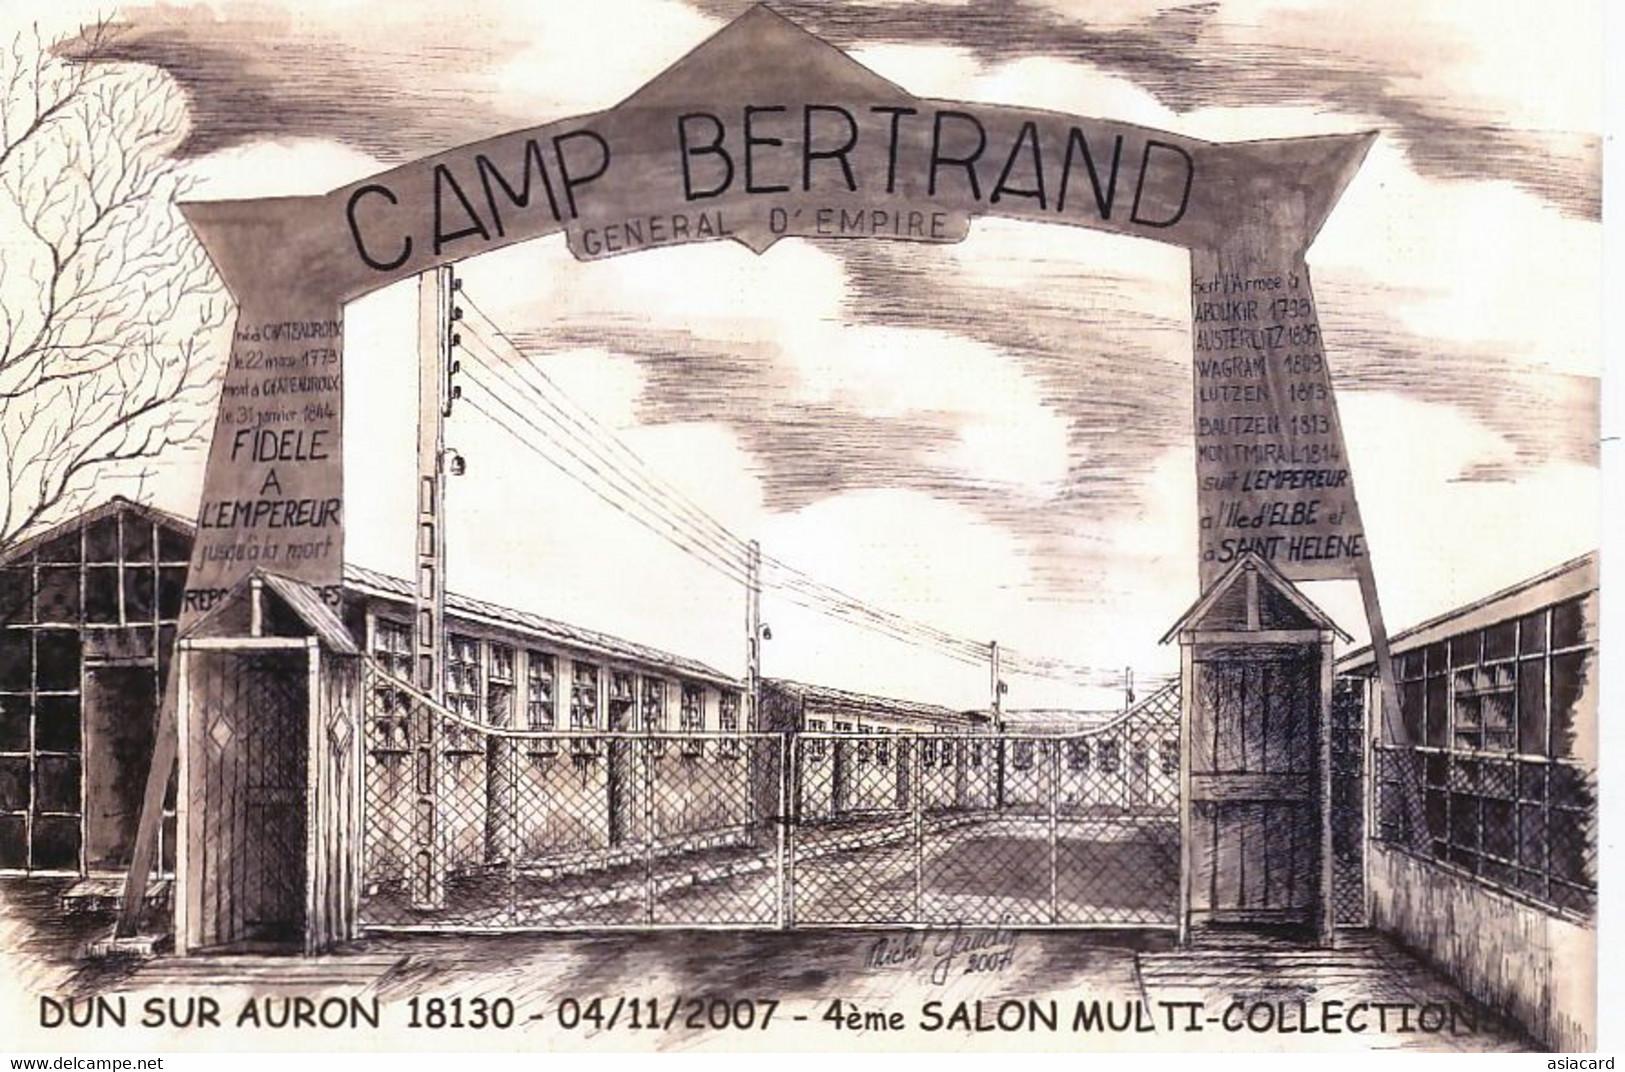 CP Semi Moderne Camp Bertrand Né Chateauroux  Napoleon 1er Elbe Sainte Hélène  Lutzen Bautzen Aboukir - Saint Helena Island